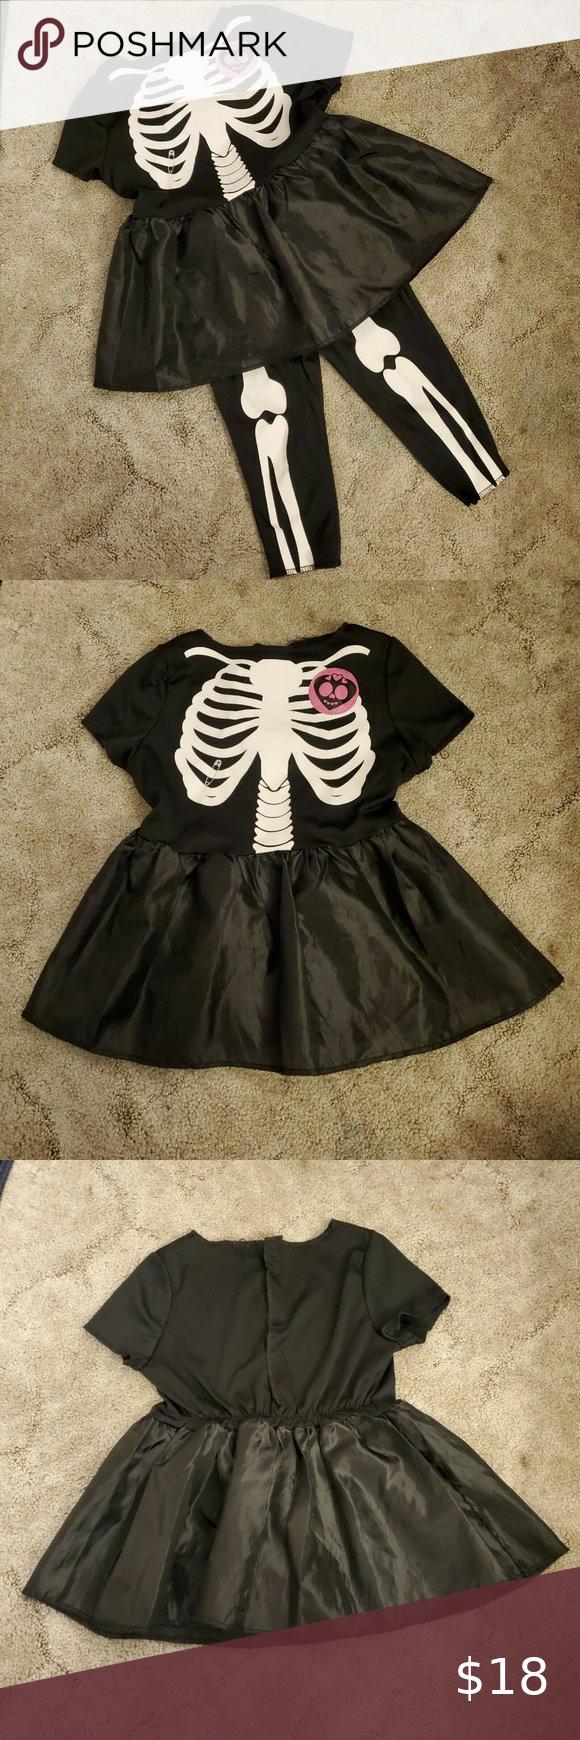 Little Girls 2 Piece Skeleton Costume Dress Black Short Sleeve Dress Costume Dress Dresses [ 1740 x 580 Pixel ]